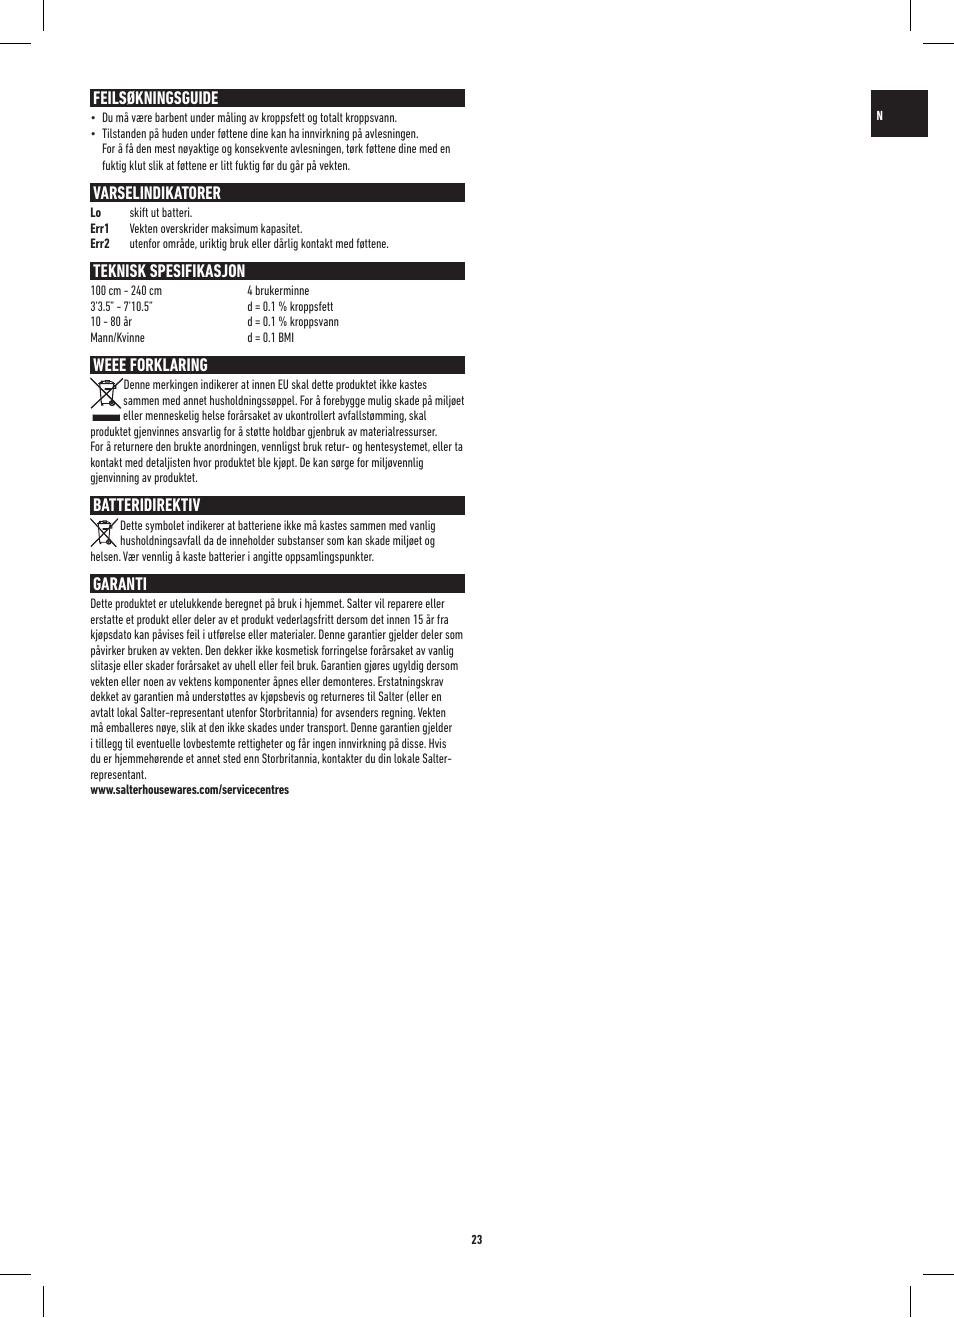 Feilsøkningsguide, Varselindikatorer, Teknisk